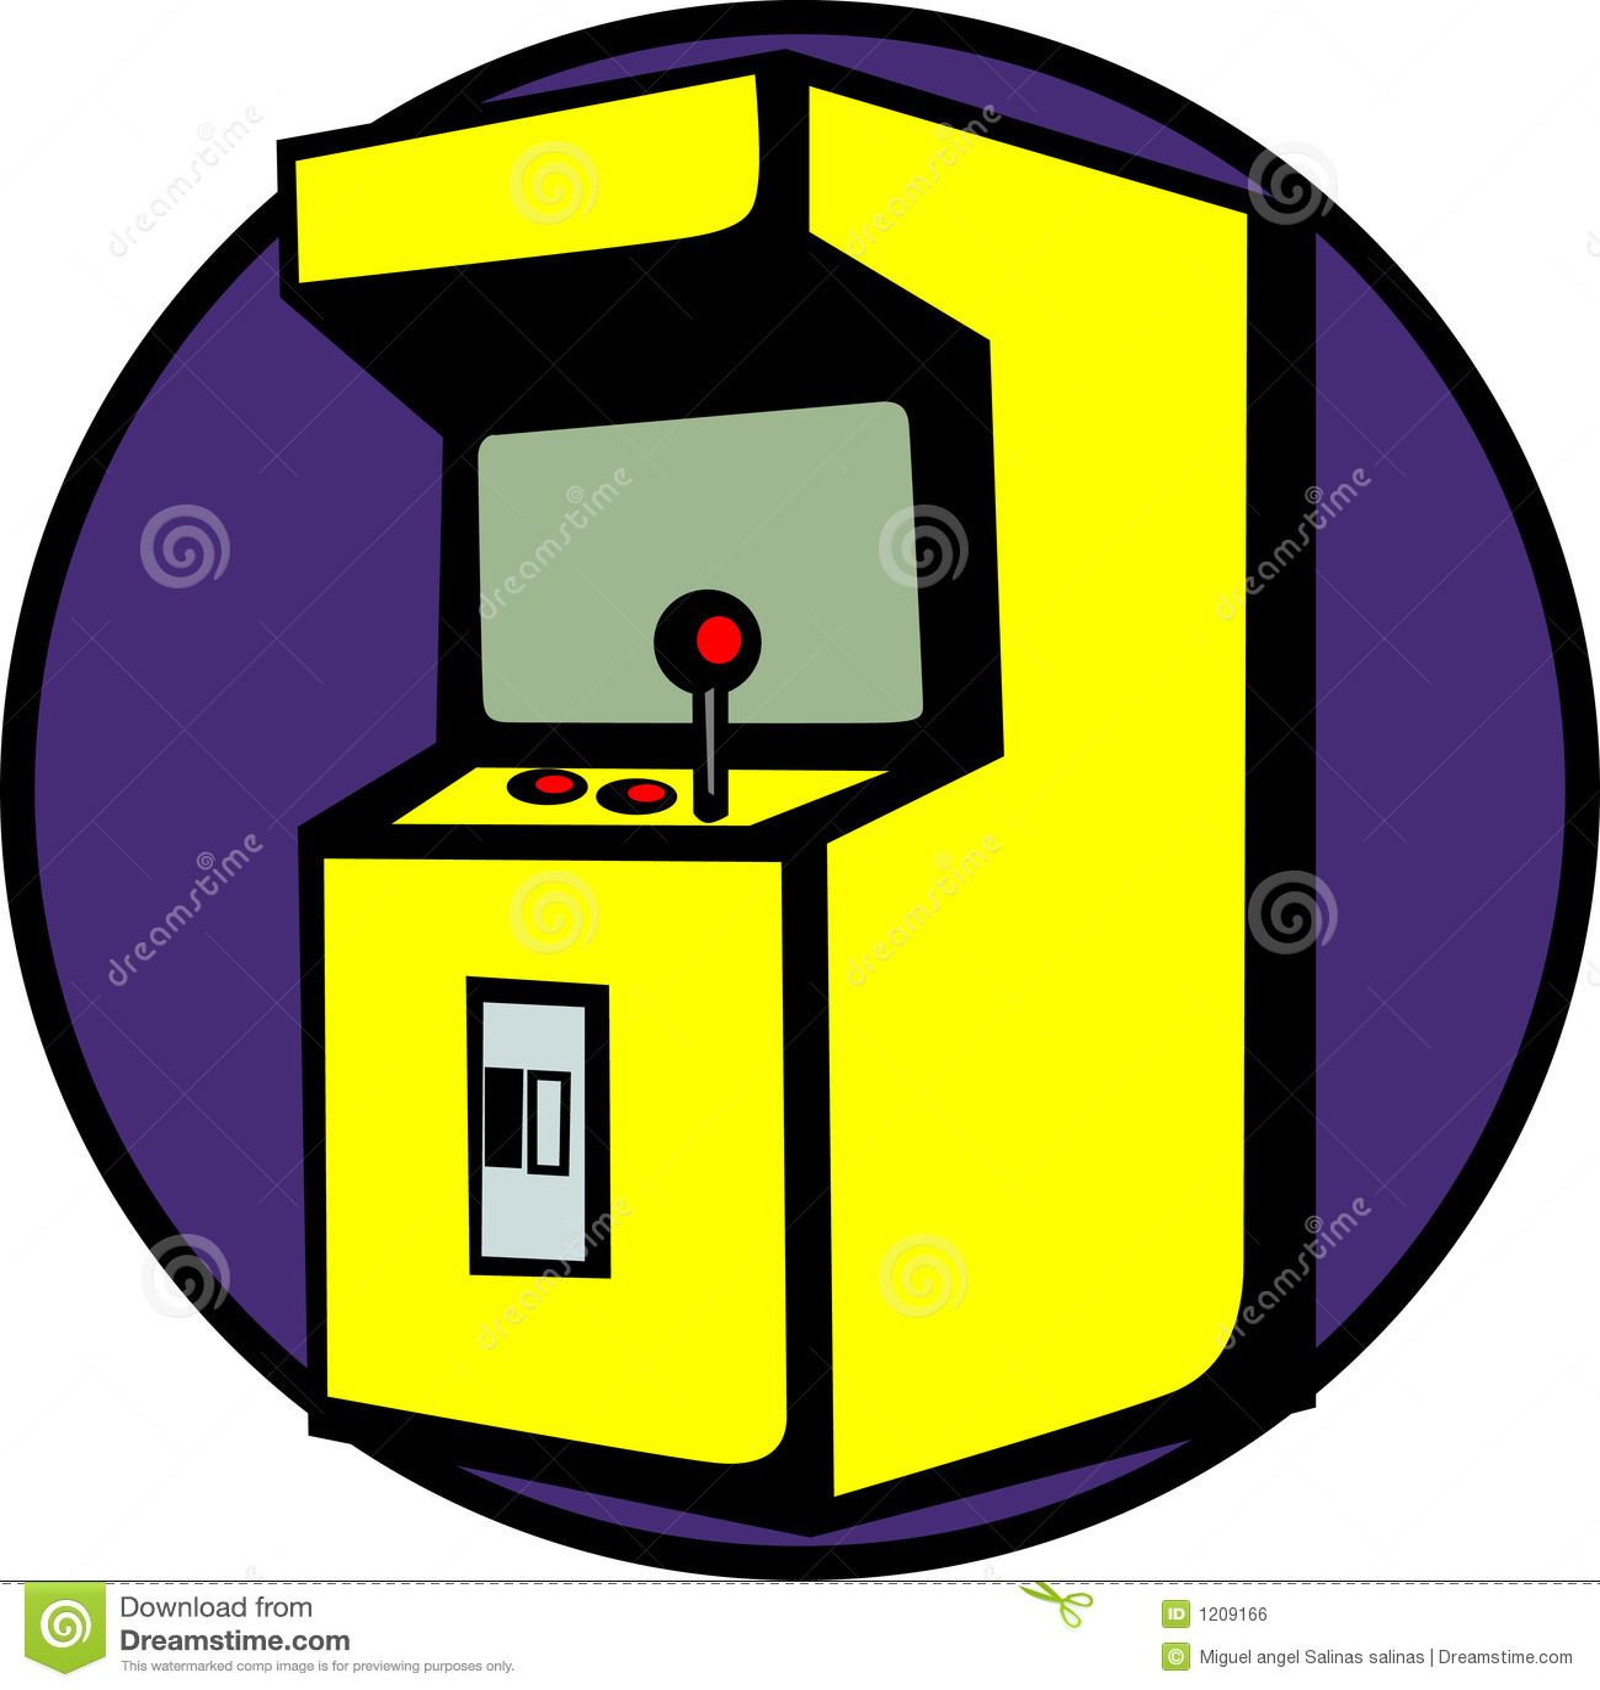 Videogame Arcade Machine Vector Illustration Royalty Free Stock ...